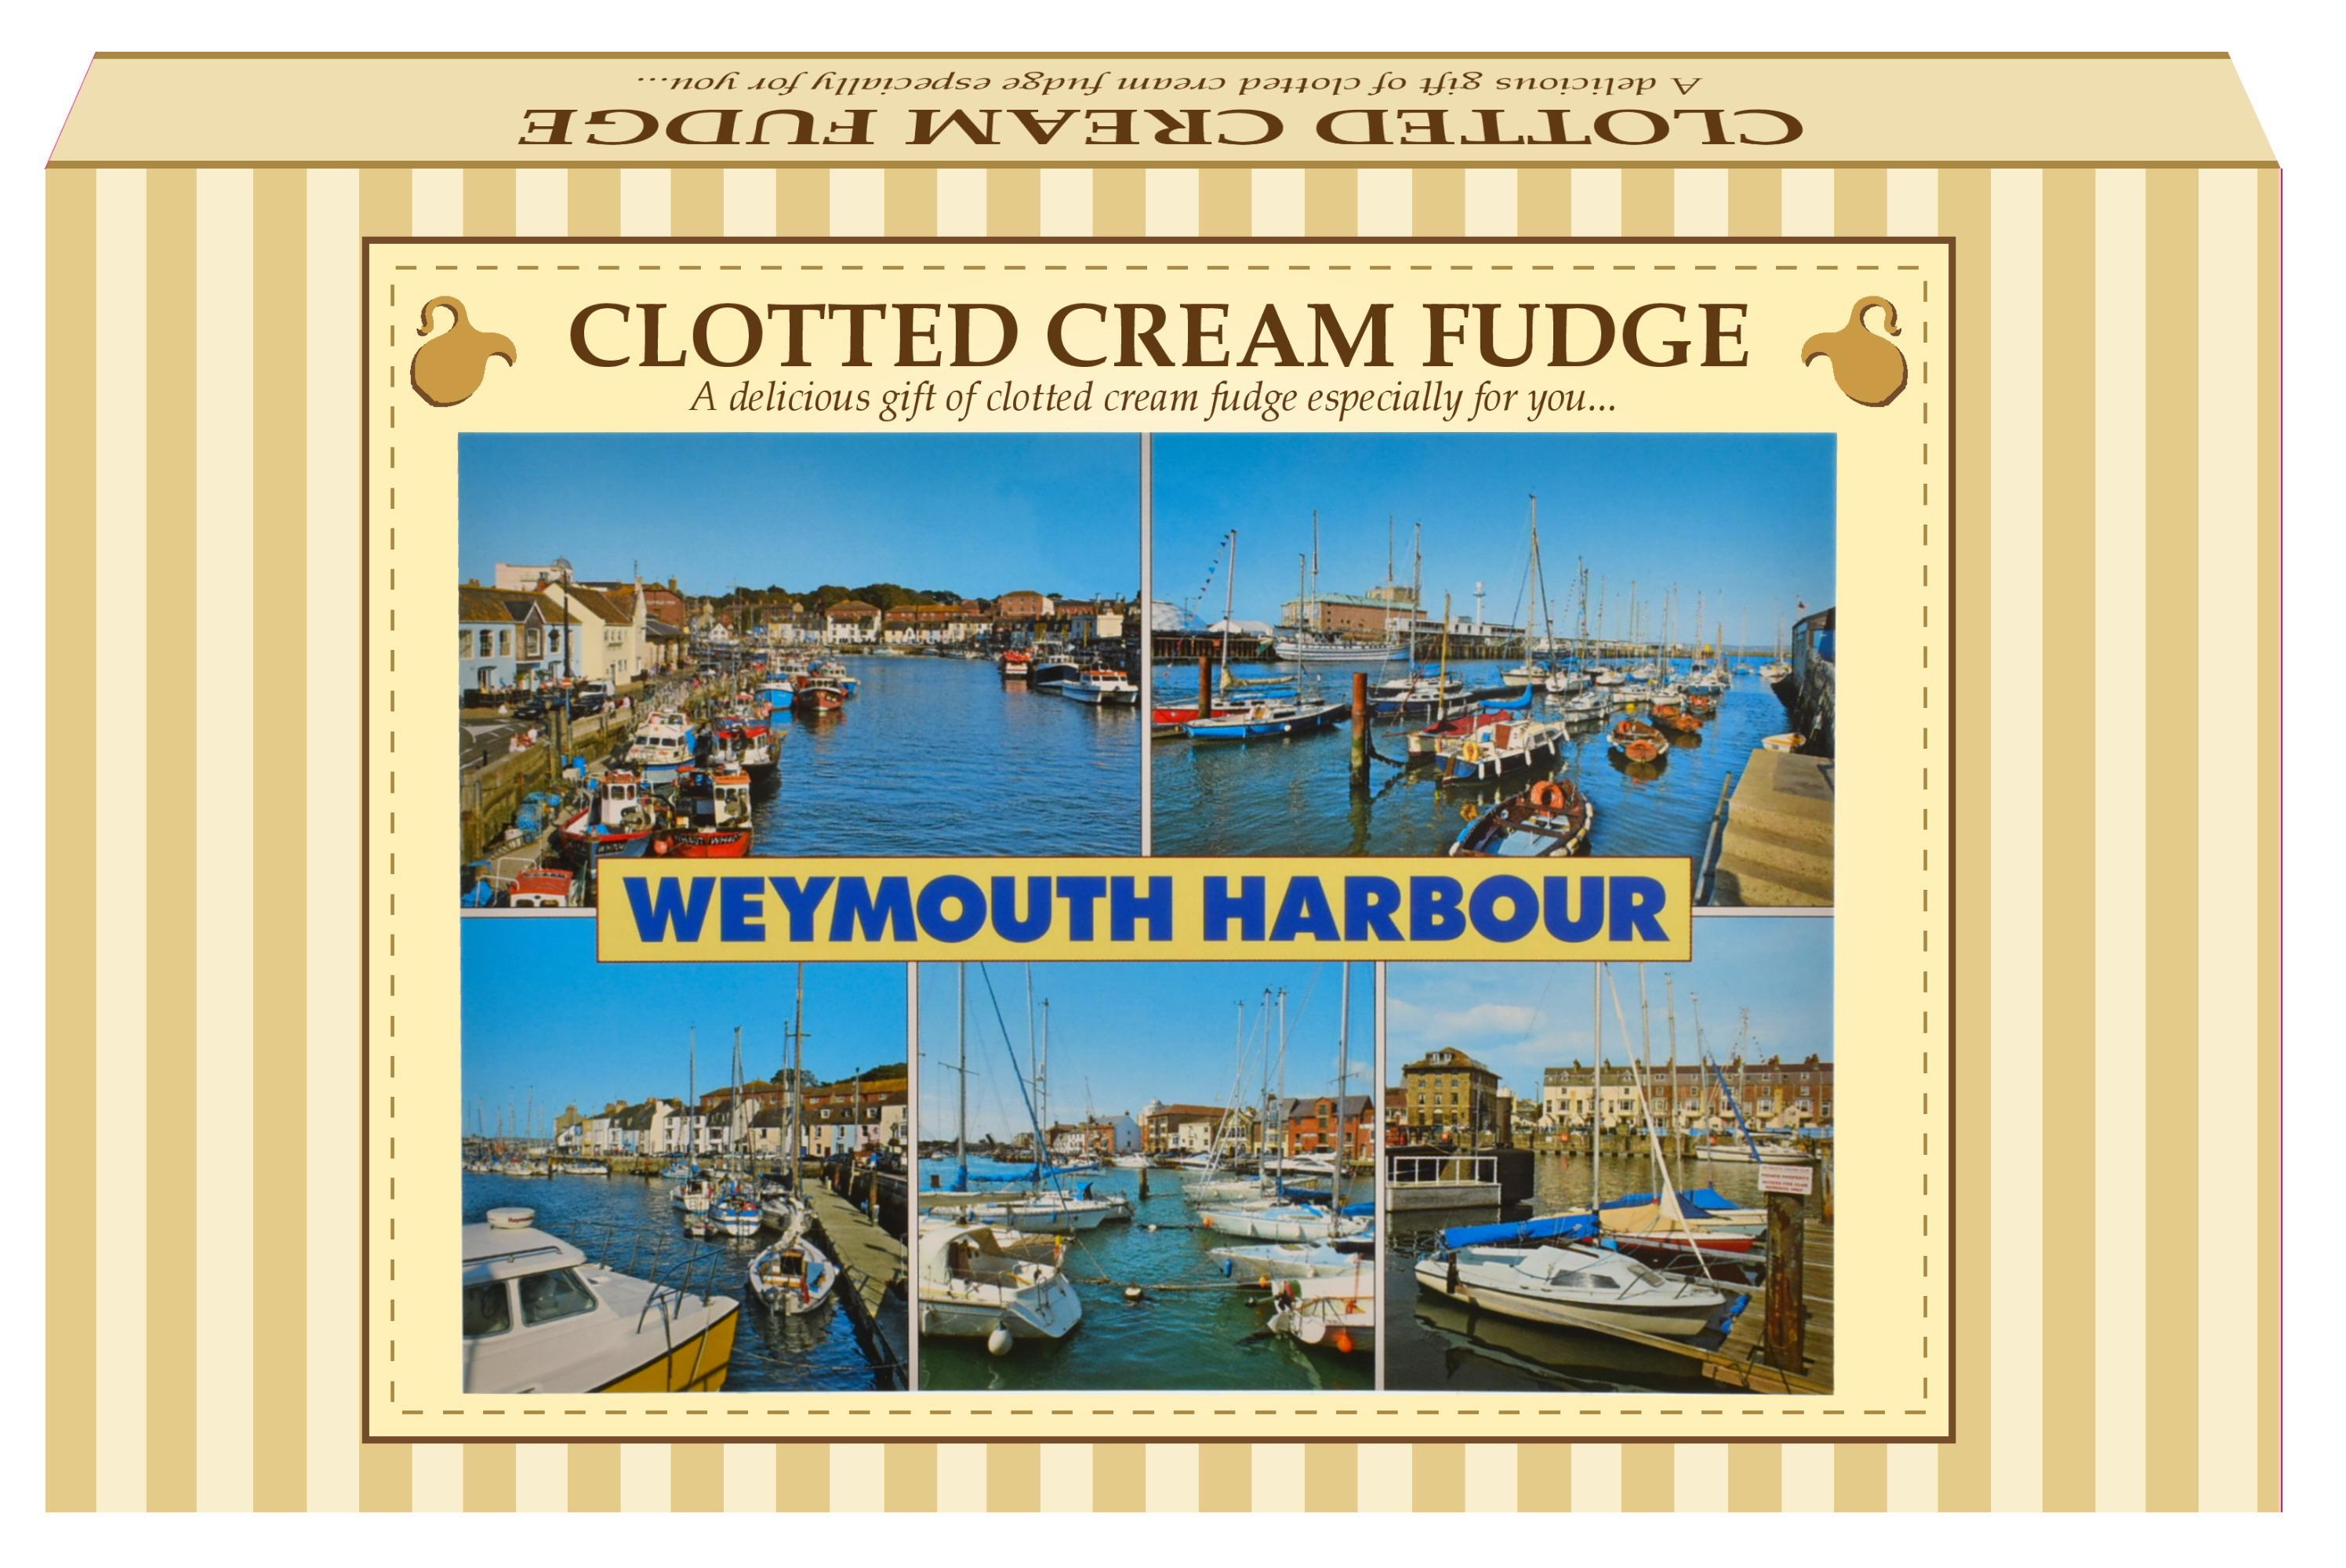 300g Clotted Cream Fudge Postcard Gift Box